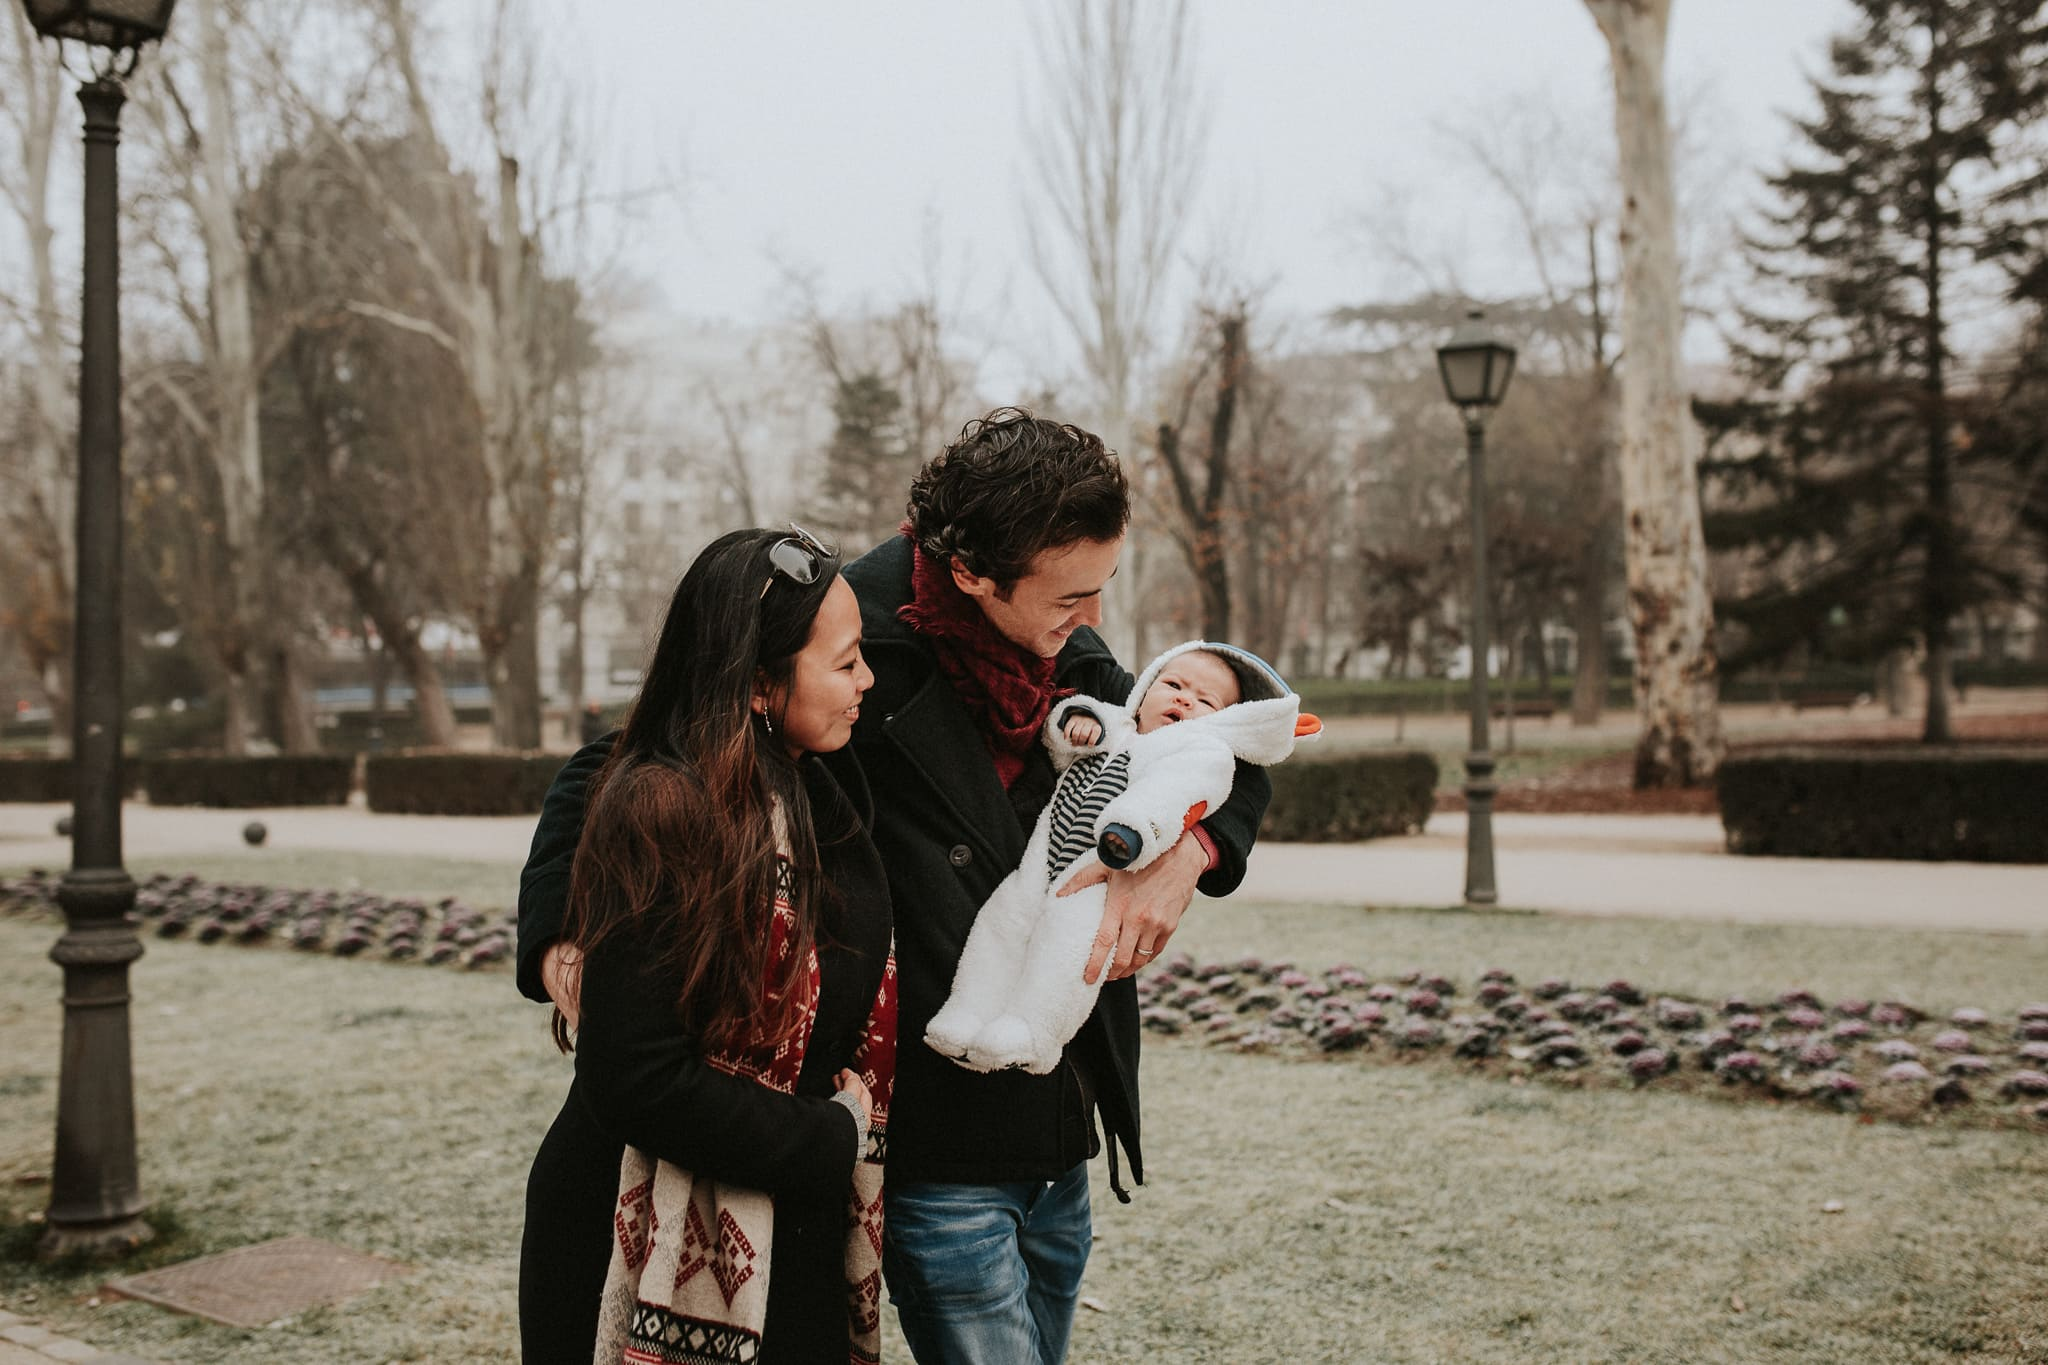 Family-Photoshoot-Madrid-19